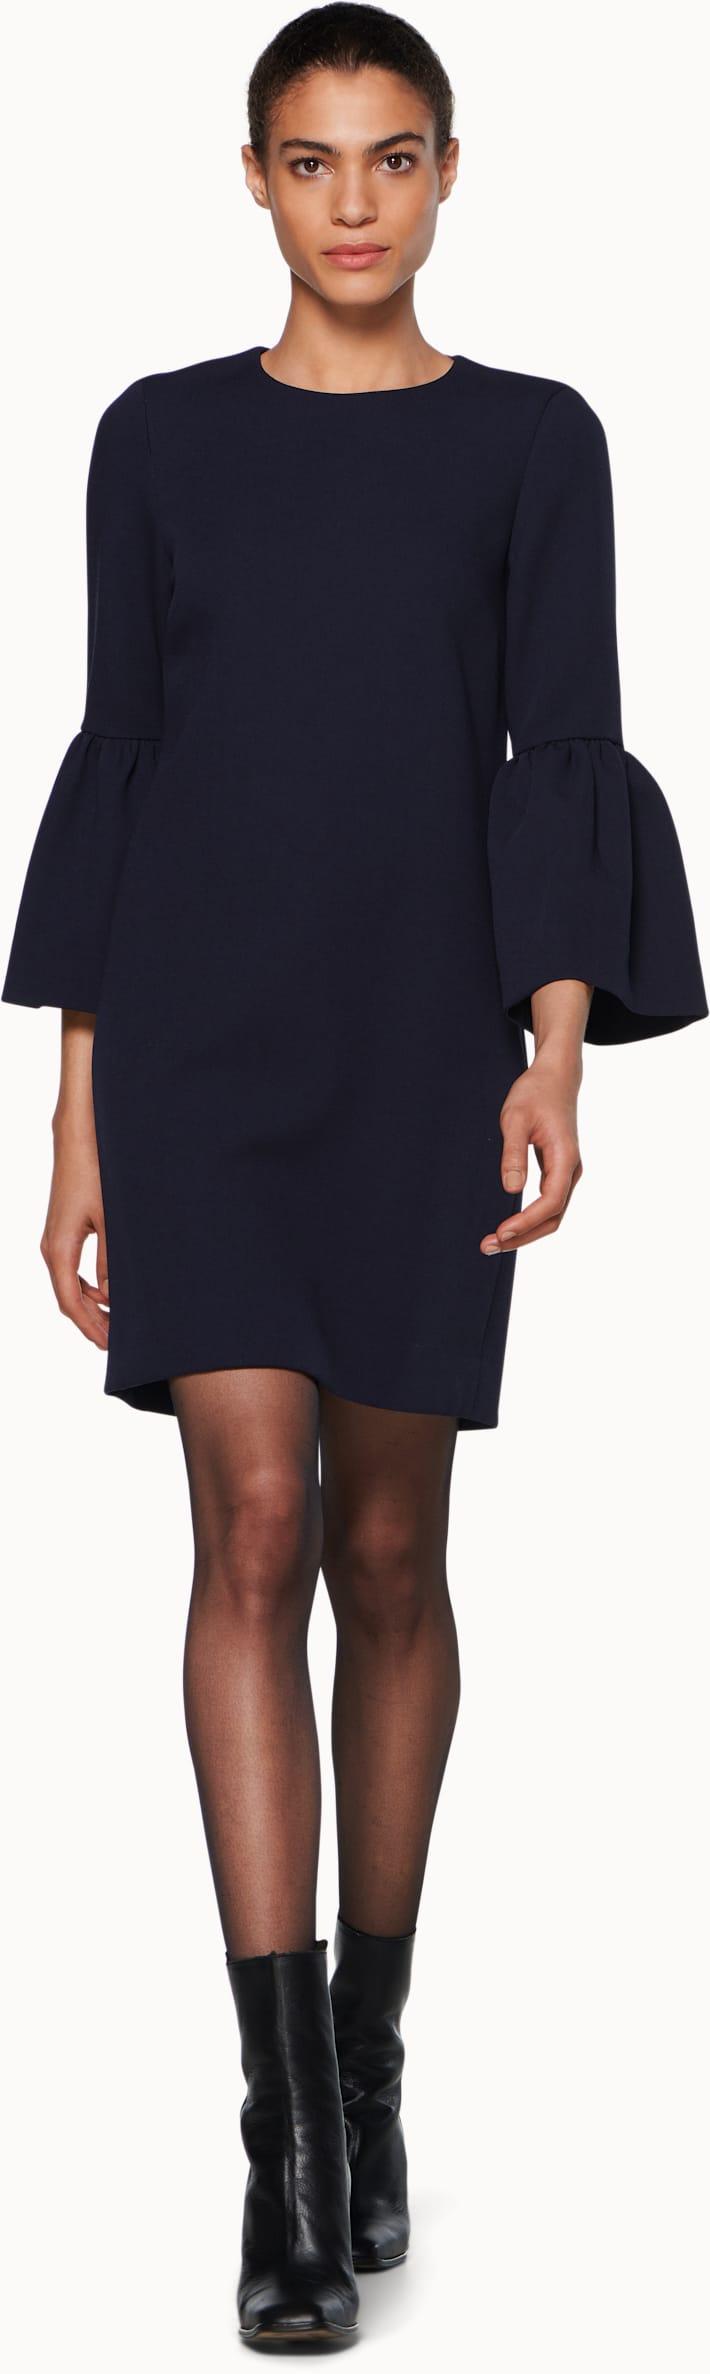 Coby Navy  Dress